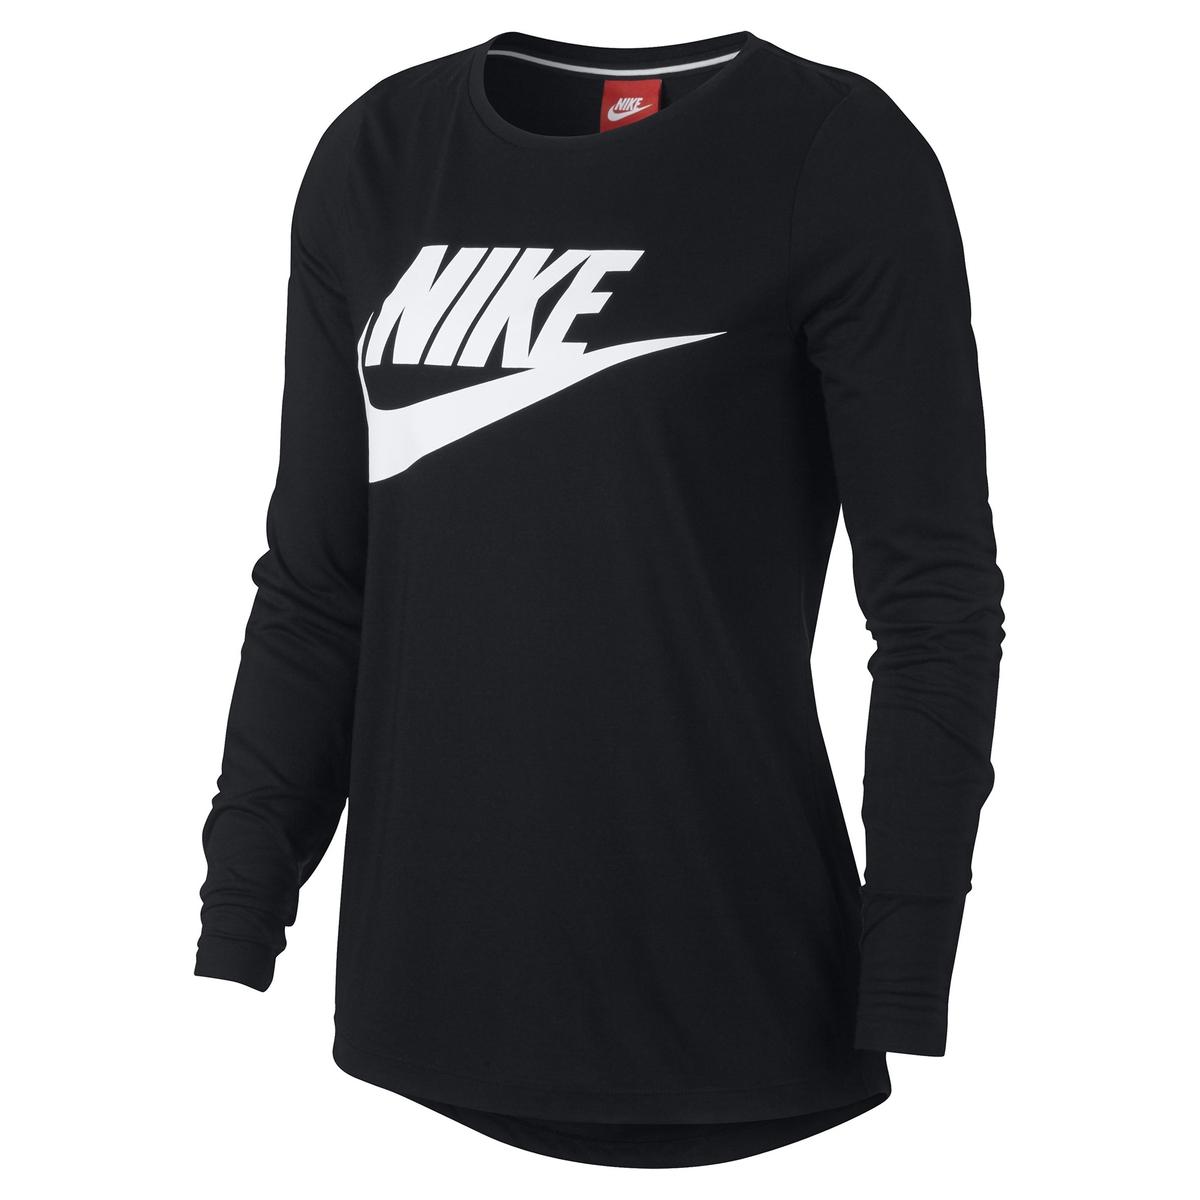 Camiseta de manga larga con cuello redondo y logotipo Sportswear